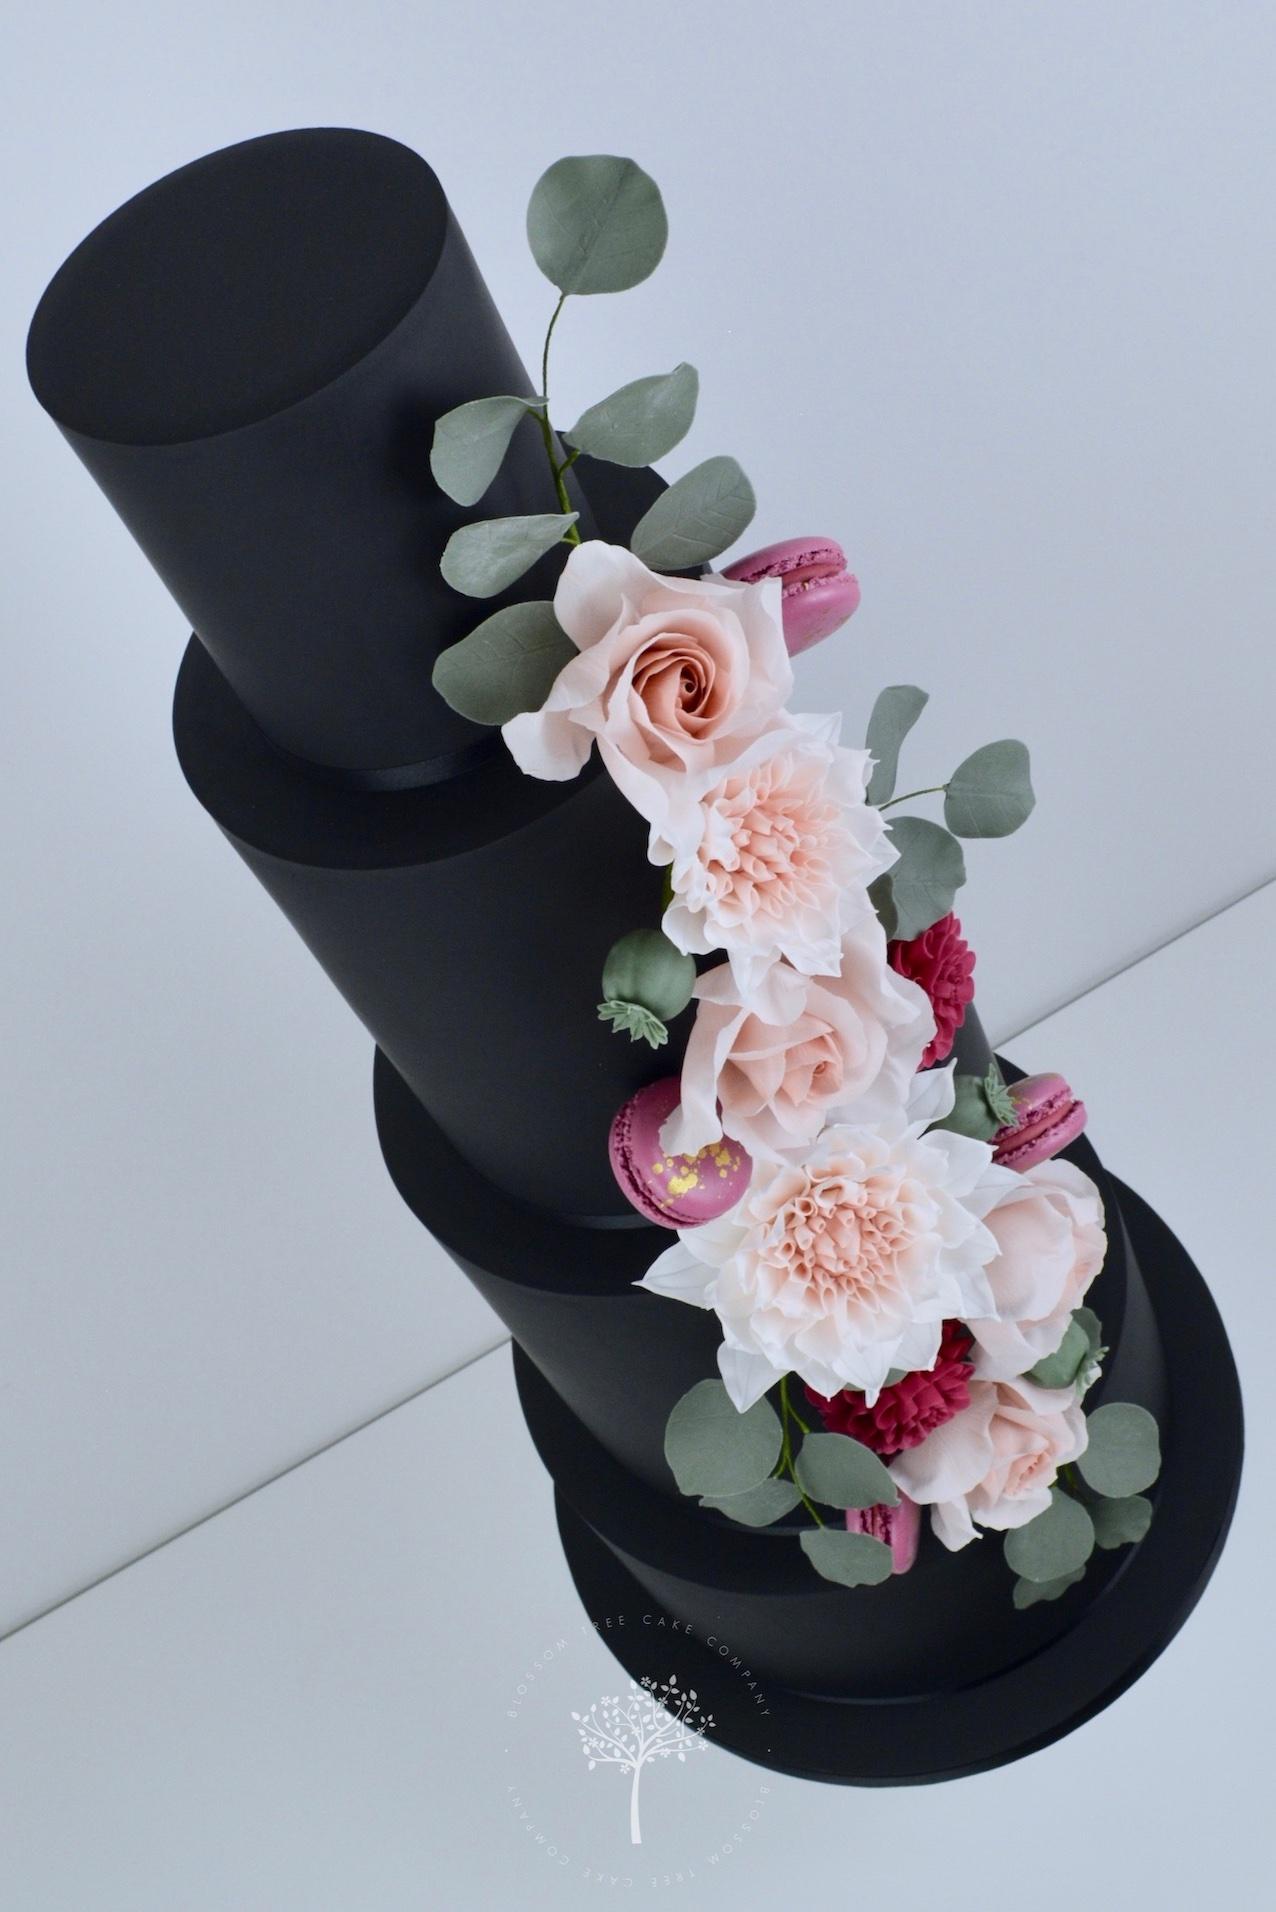 Dahlia & Black wedding cake by Blossom Tree Cake Company Harrogate North Yorkshire - angle.jpg